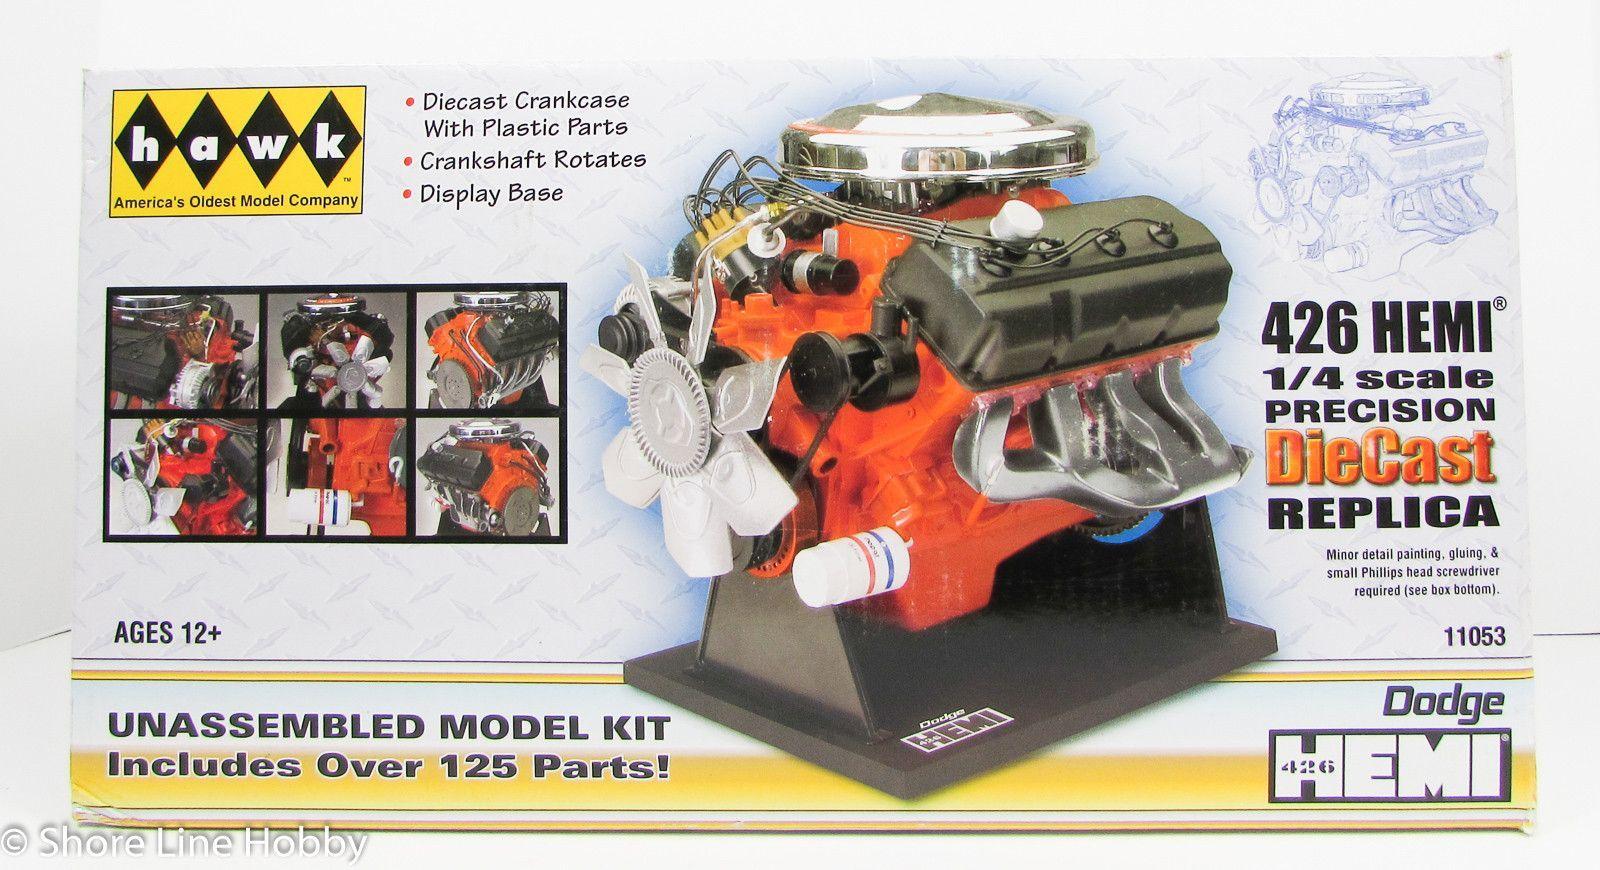 Dodge 426 HEMI V-8 Diecast Engine Hawk 11053 1/4 New Model Kit